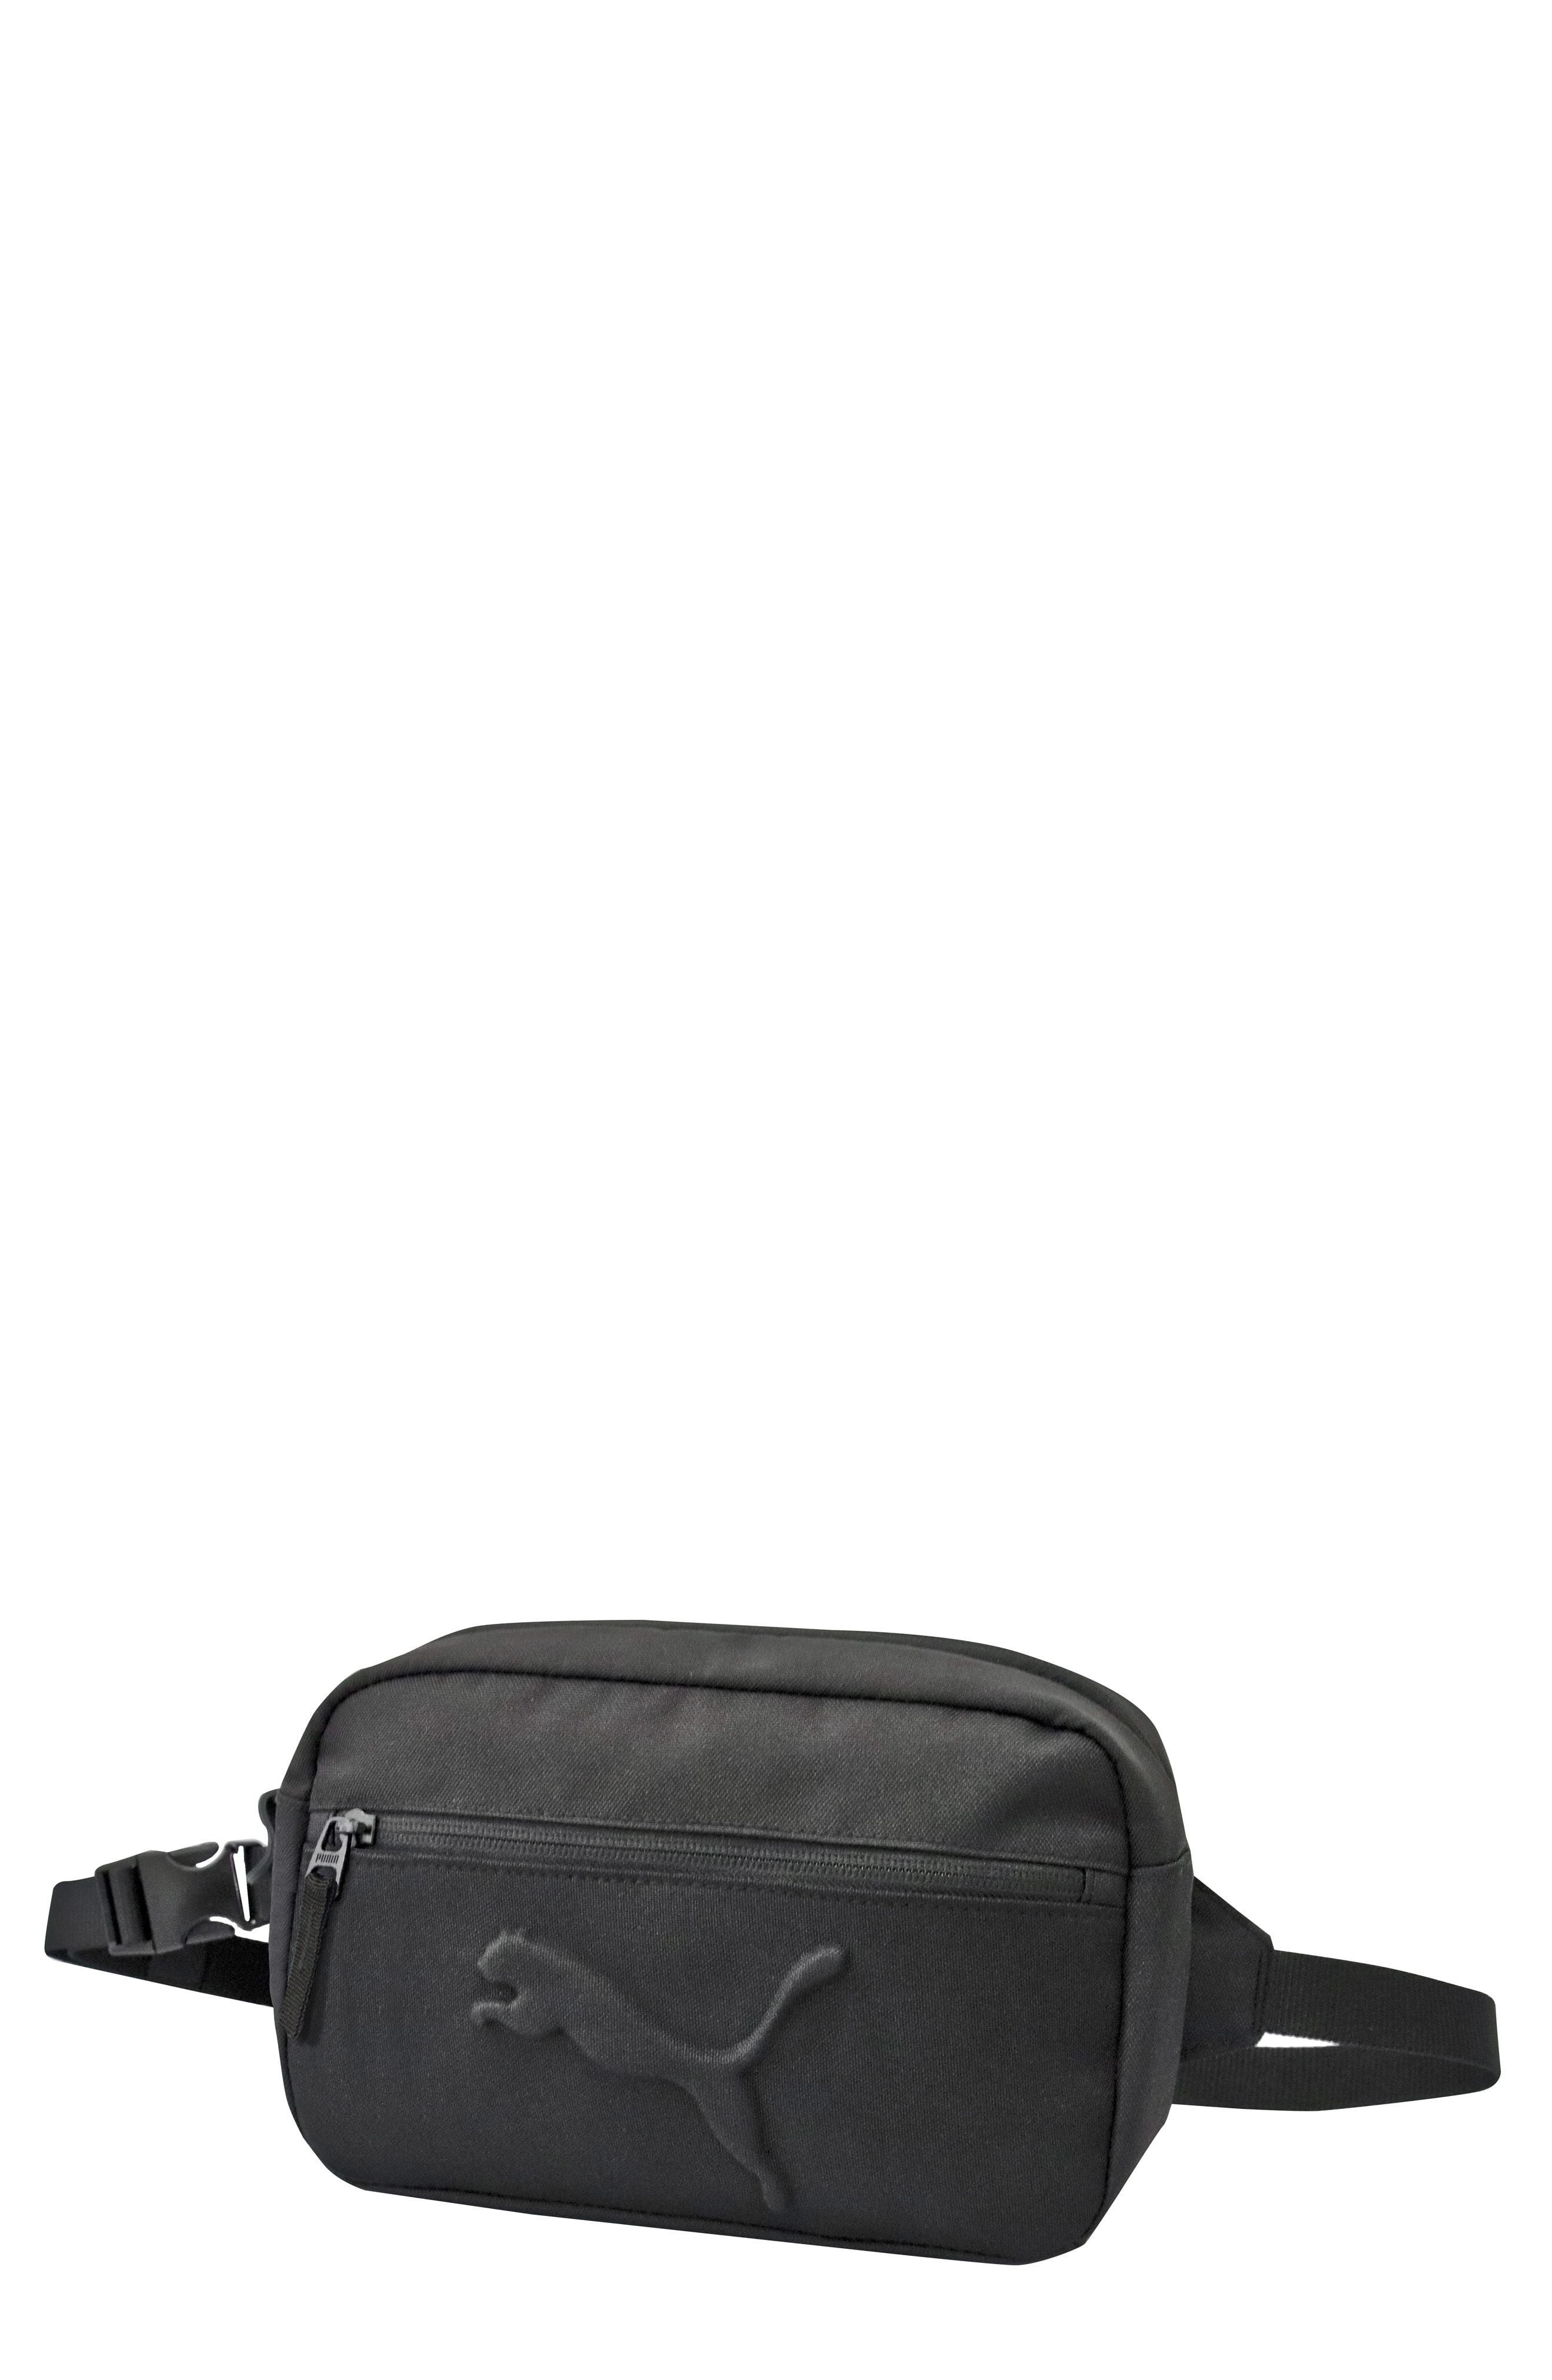 80911294c24 Puma Reformation Belt Bag - Black | ModeSens